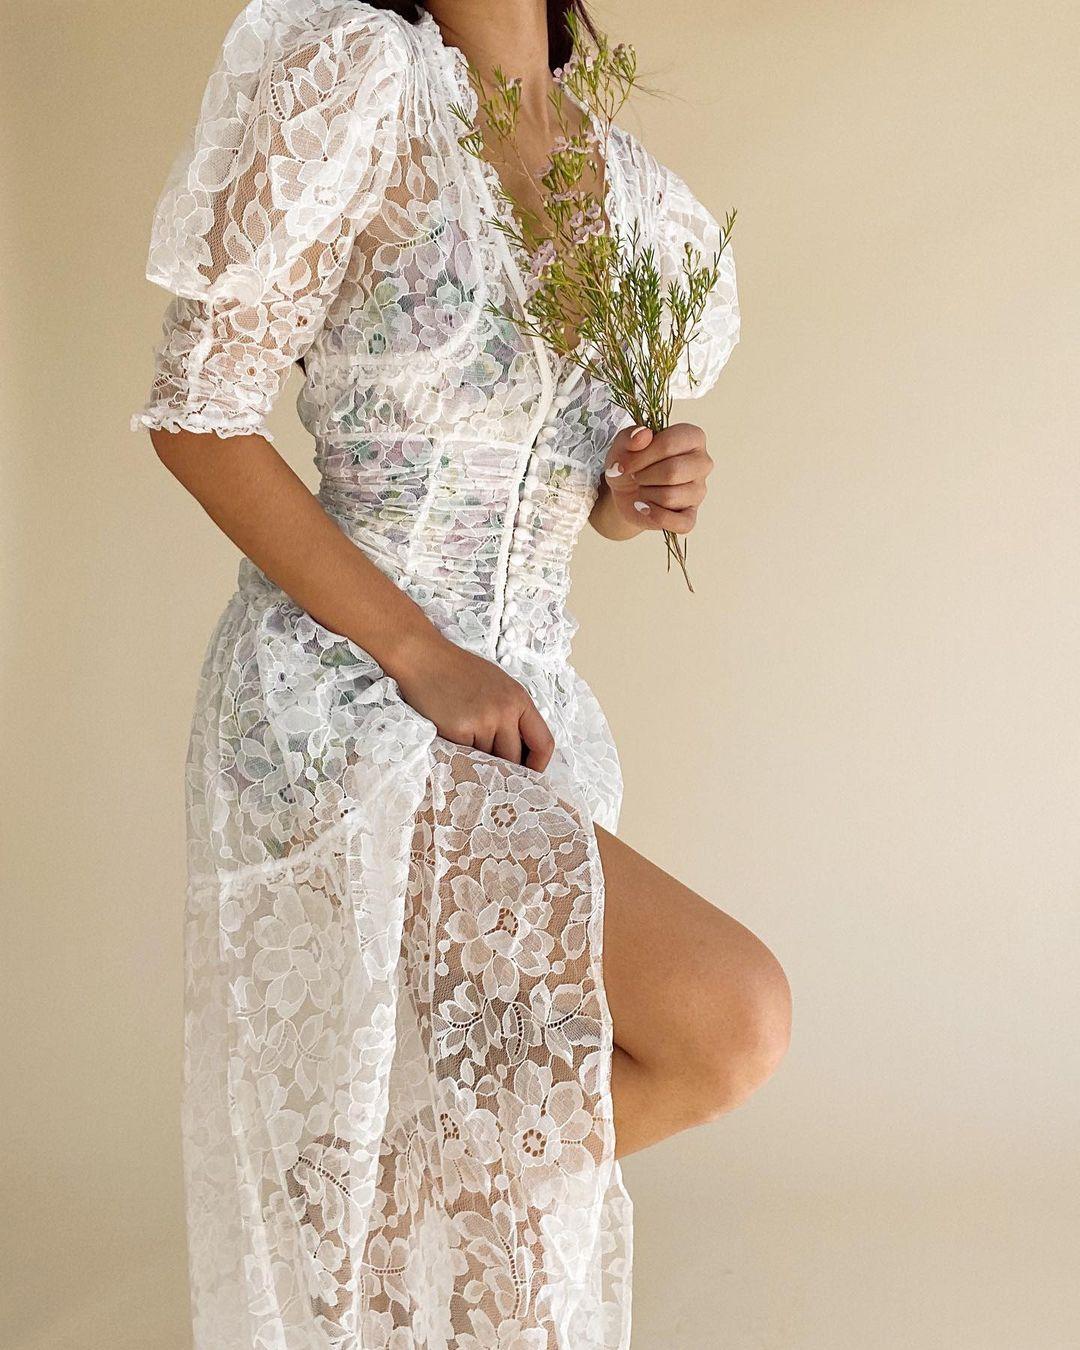 Best Little White Dresses for Bridal Showers + More in 18 + 18